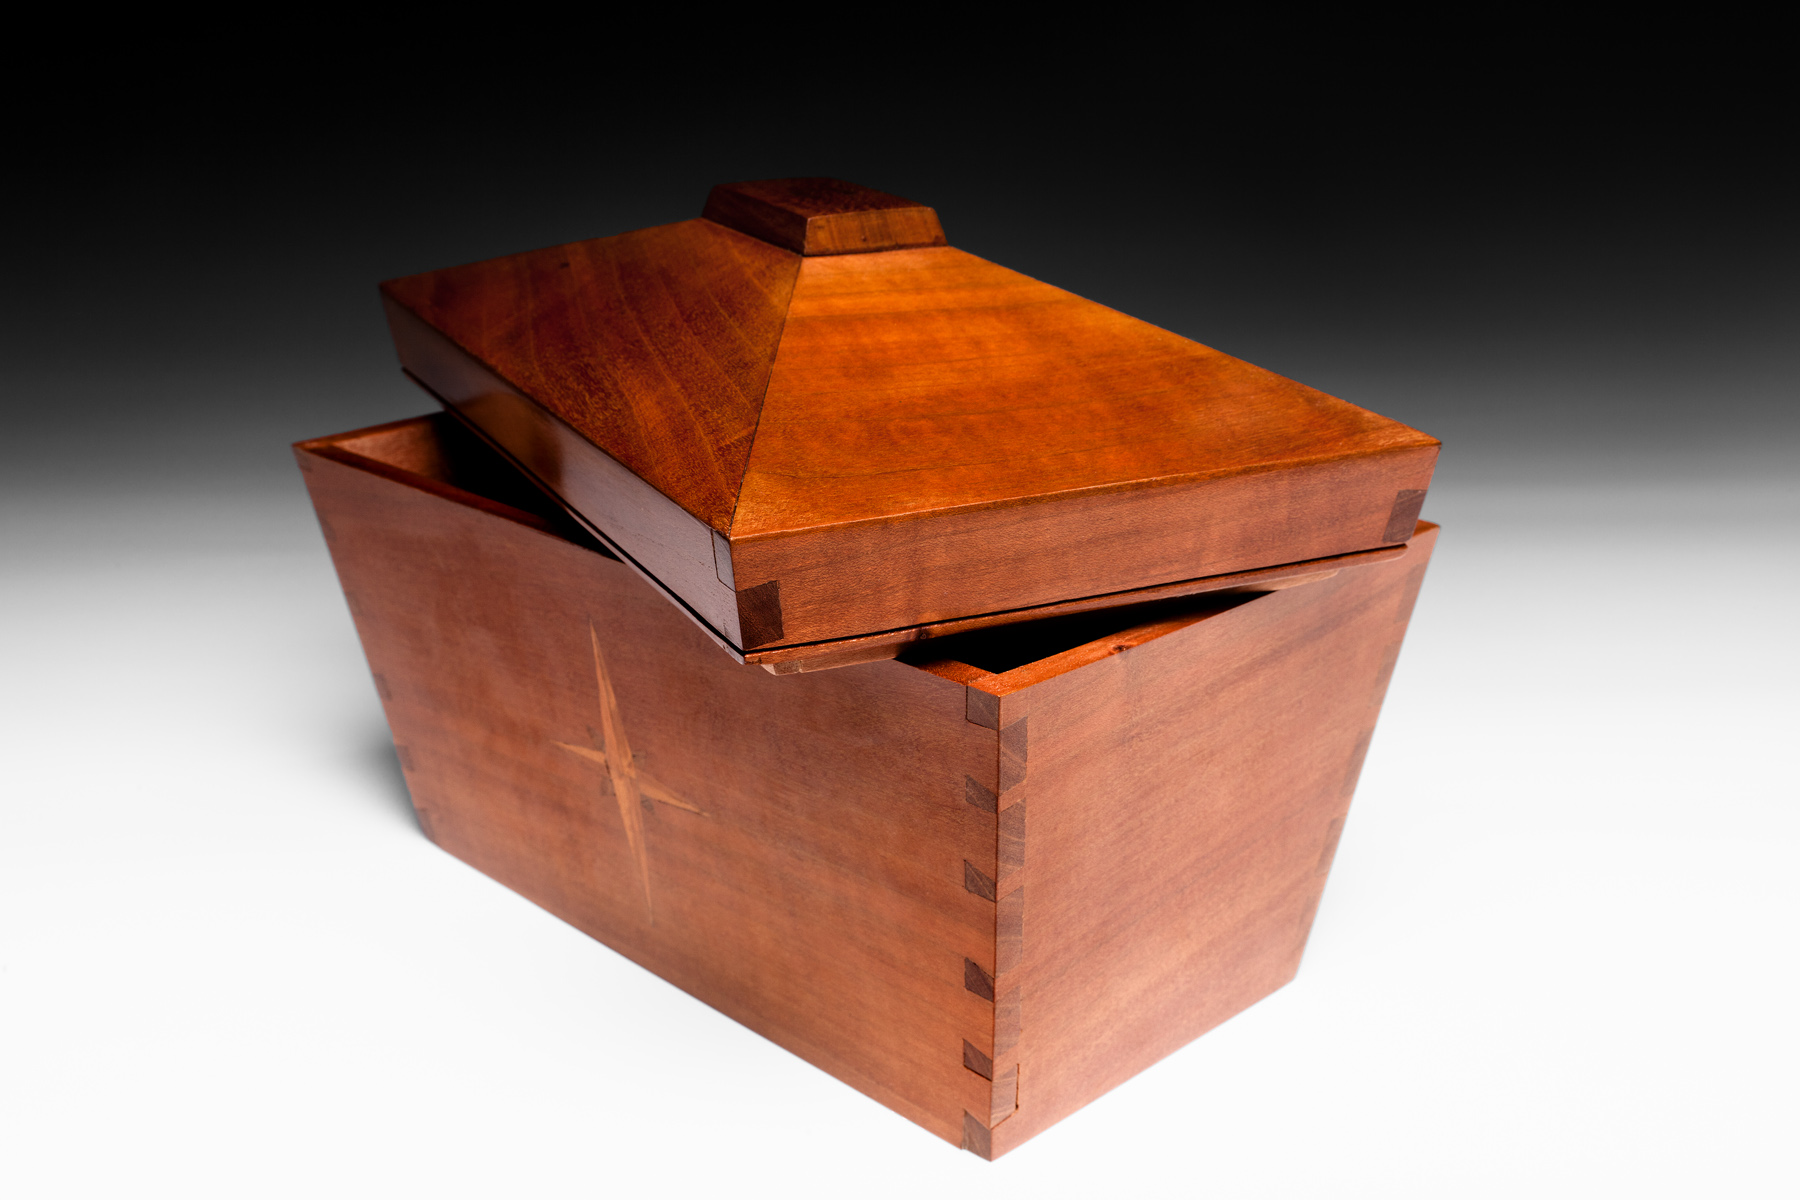 rob cart box-2232 - FINAL.jpg